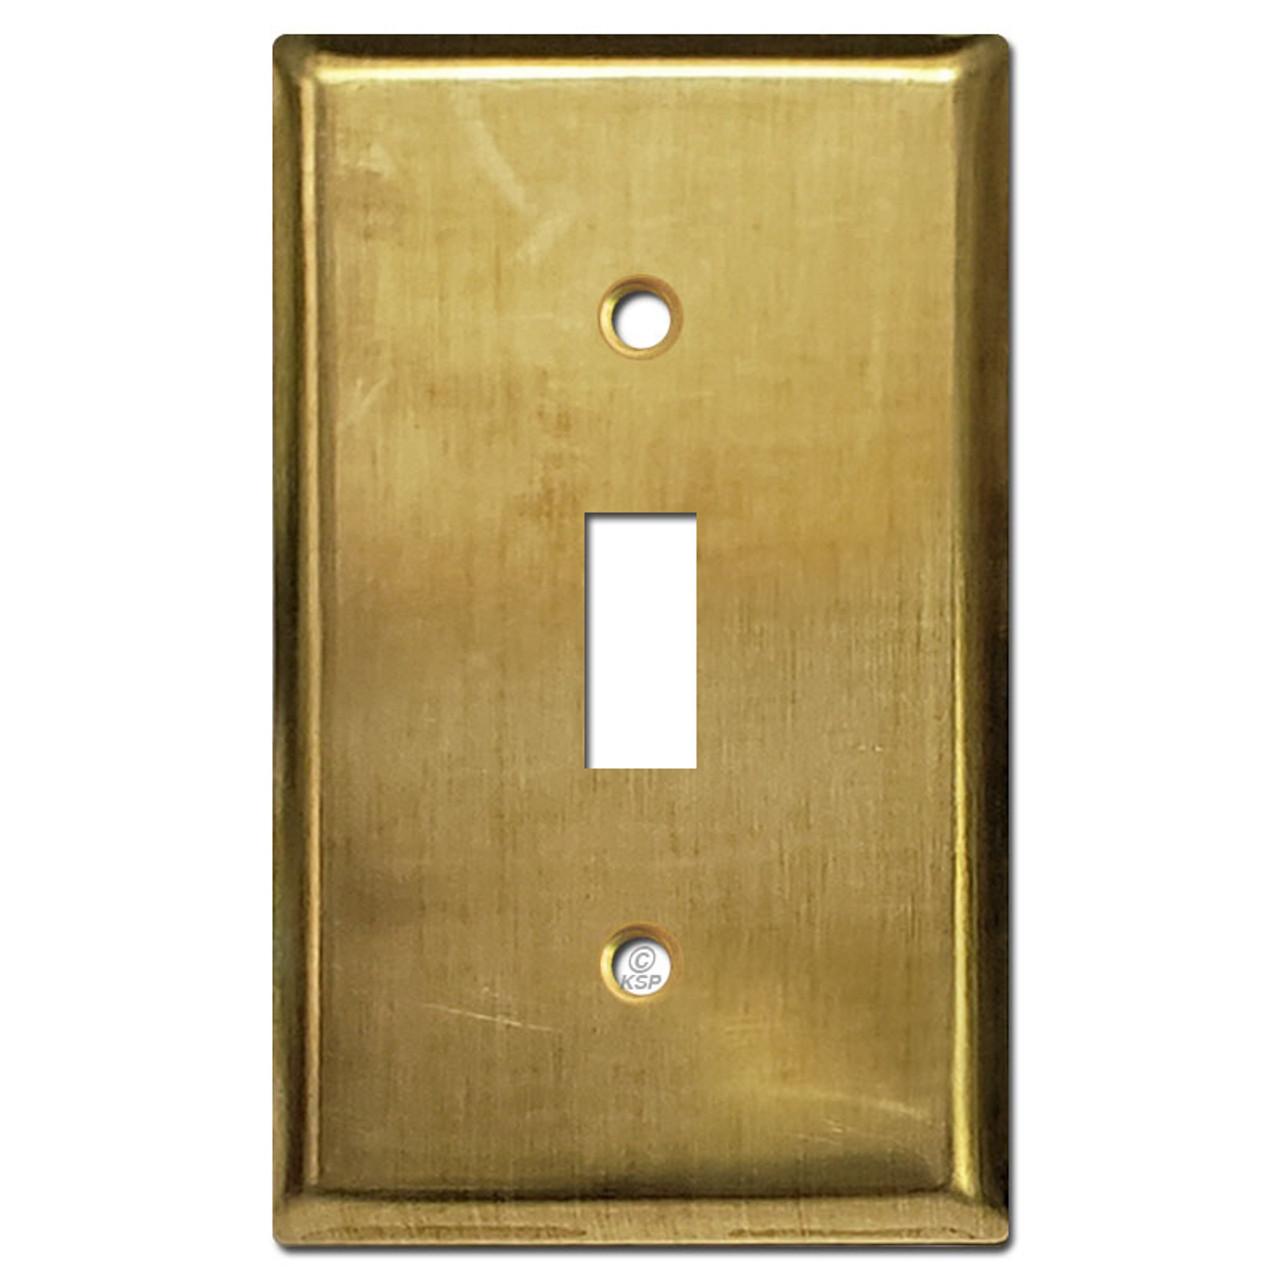 1 Toggle Light Switch Plates Unfinished Raw Brass